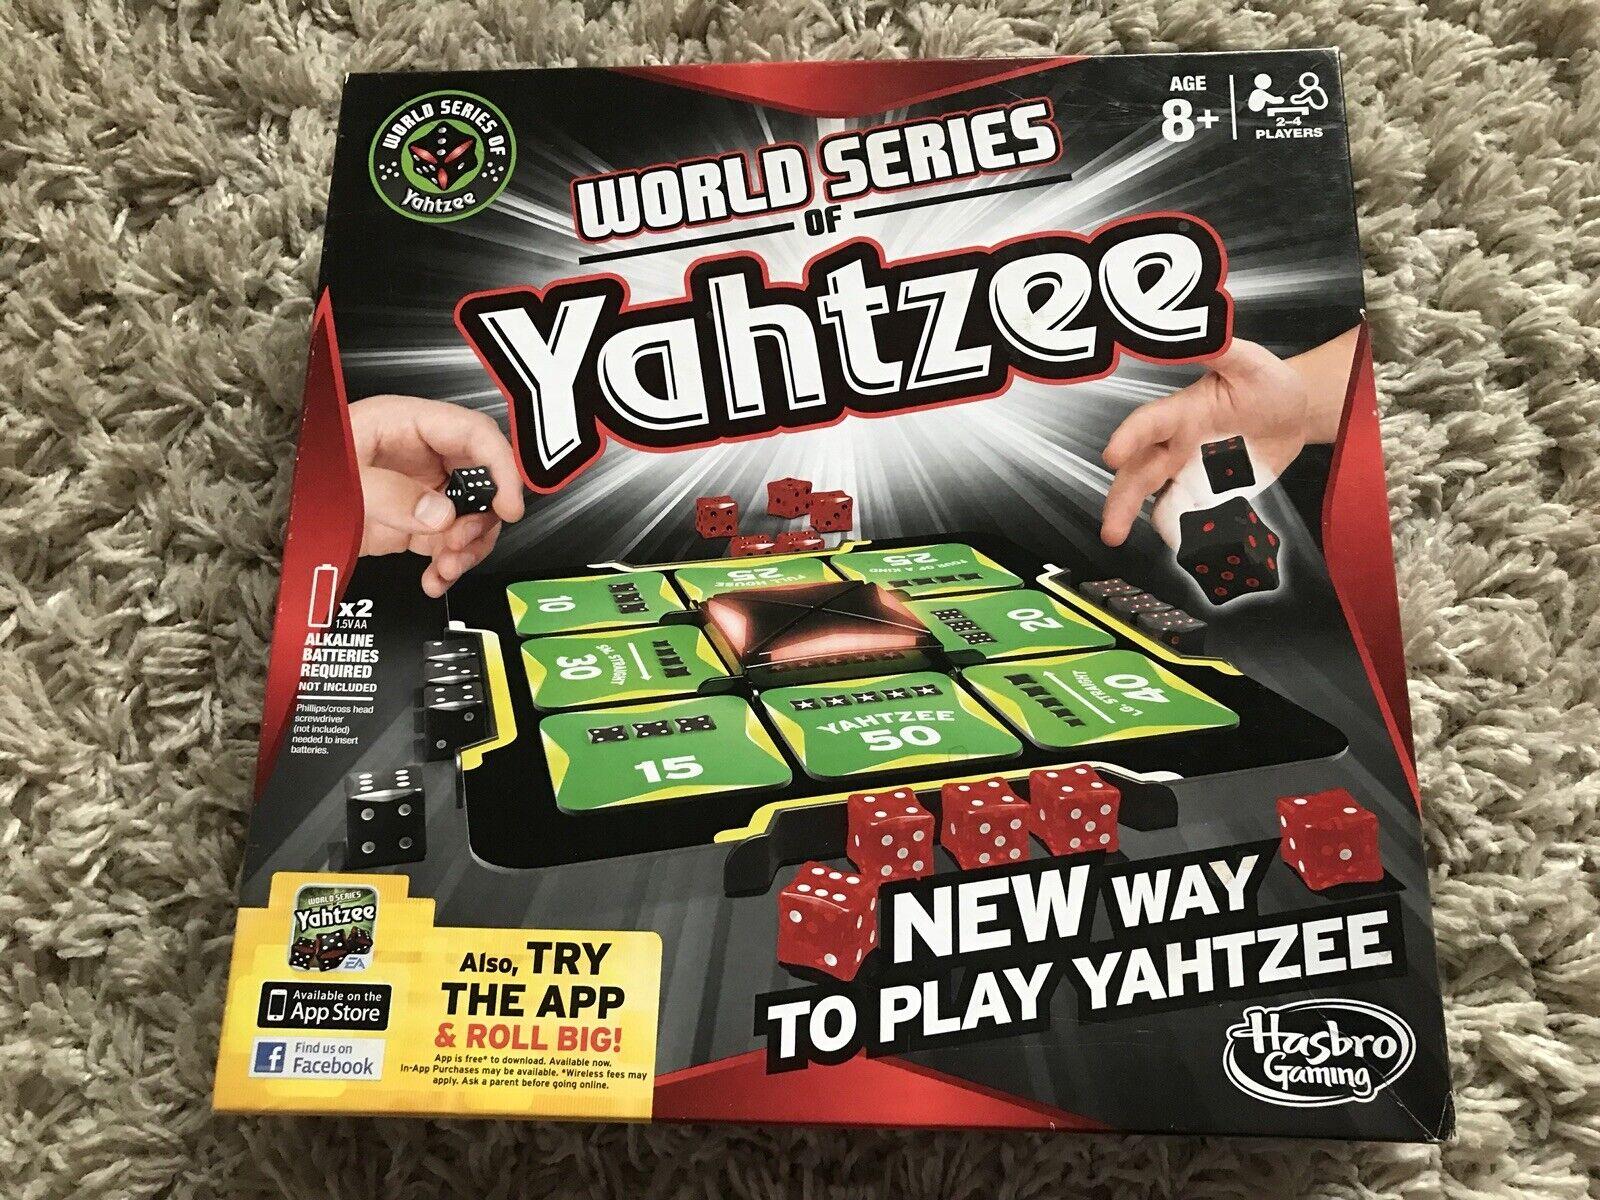 World Series of Yahtzee COMPLETE Hasbro Fun Family Game